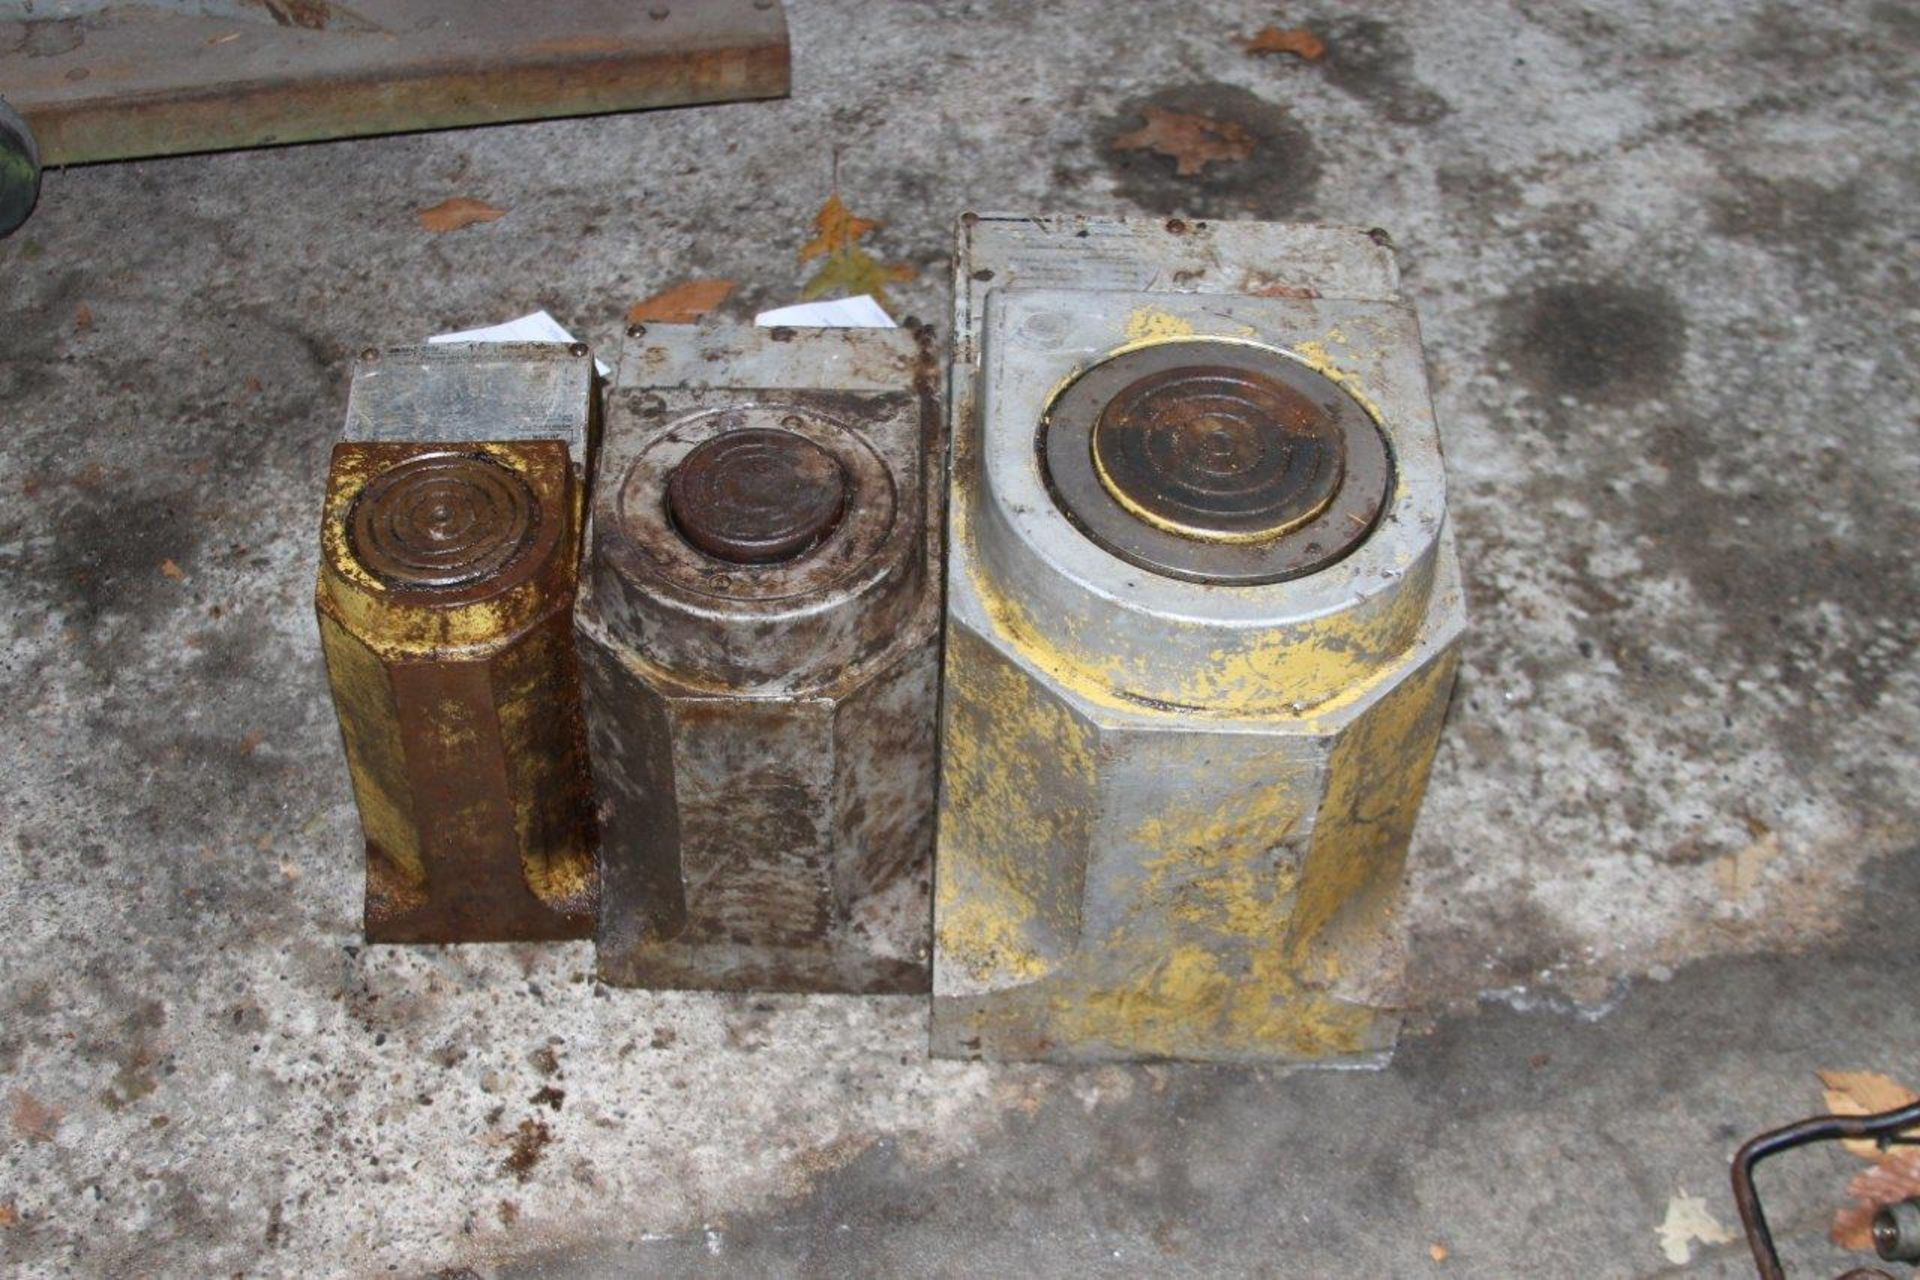 Lot 5 - Assorted Enerpac Safe-T-Lite Pumps. Includes a 100 Ton and a 50 Ton Unit.